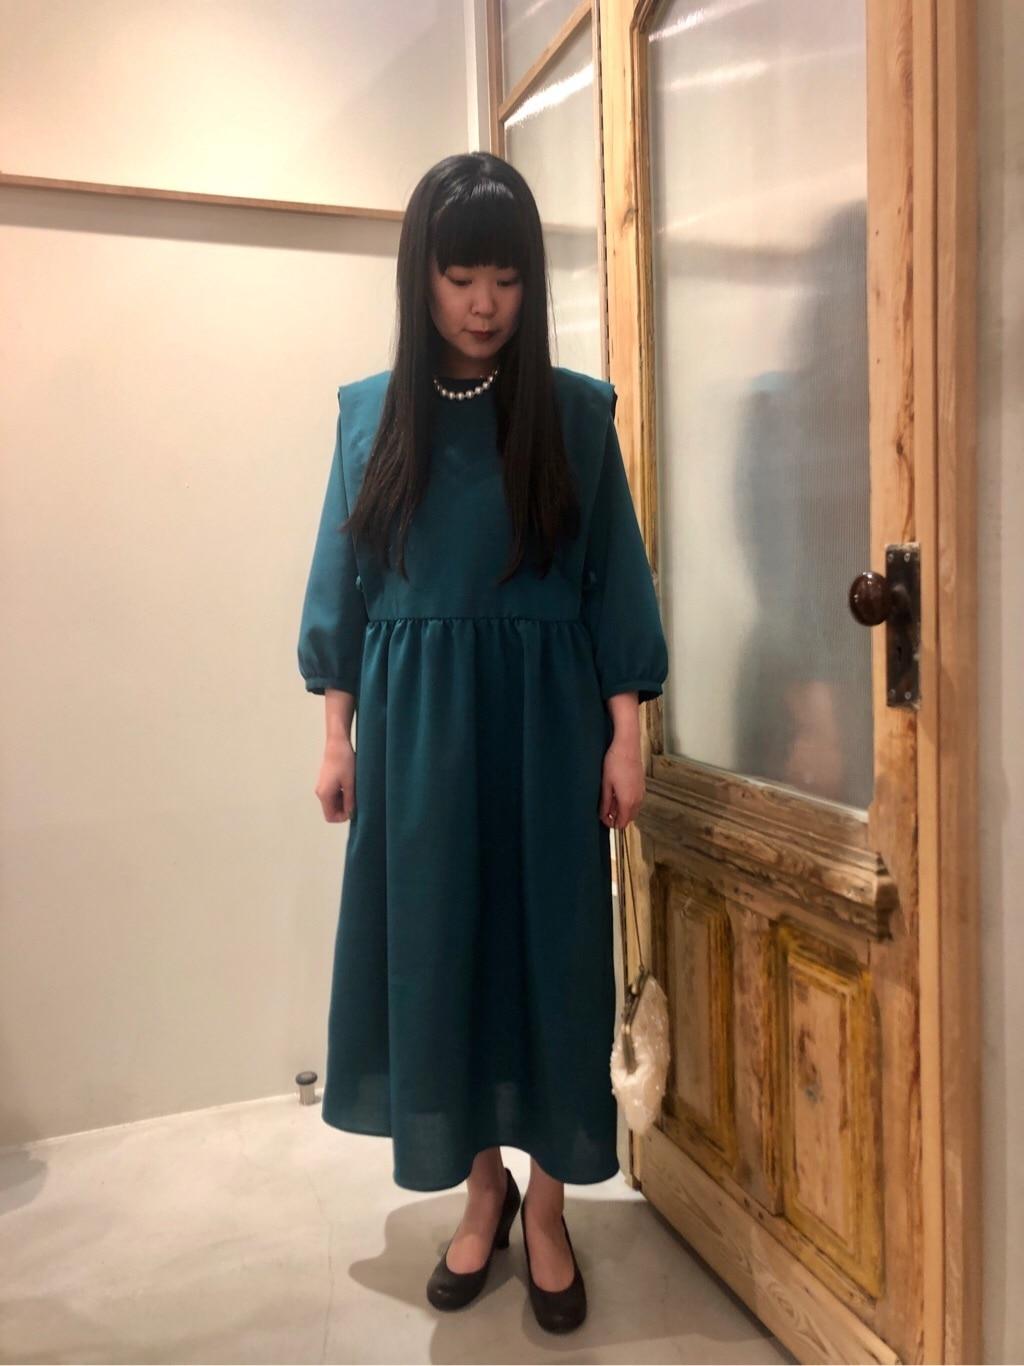 bulle de savon 渋谷スクランブルスクエア 身長:157cm 2020.03.23